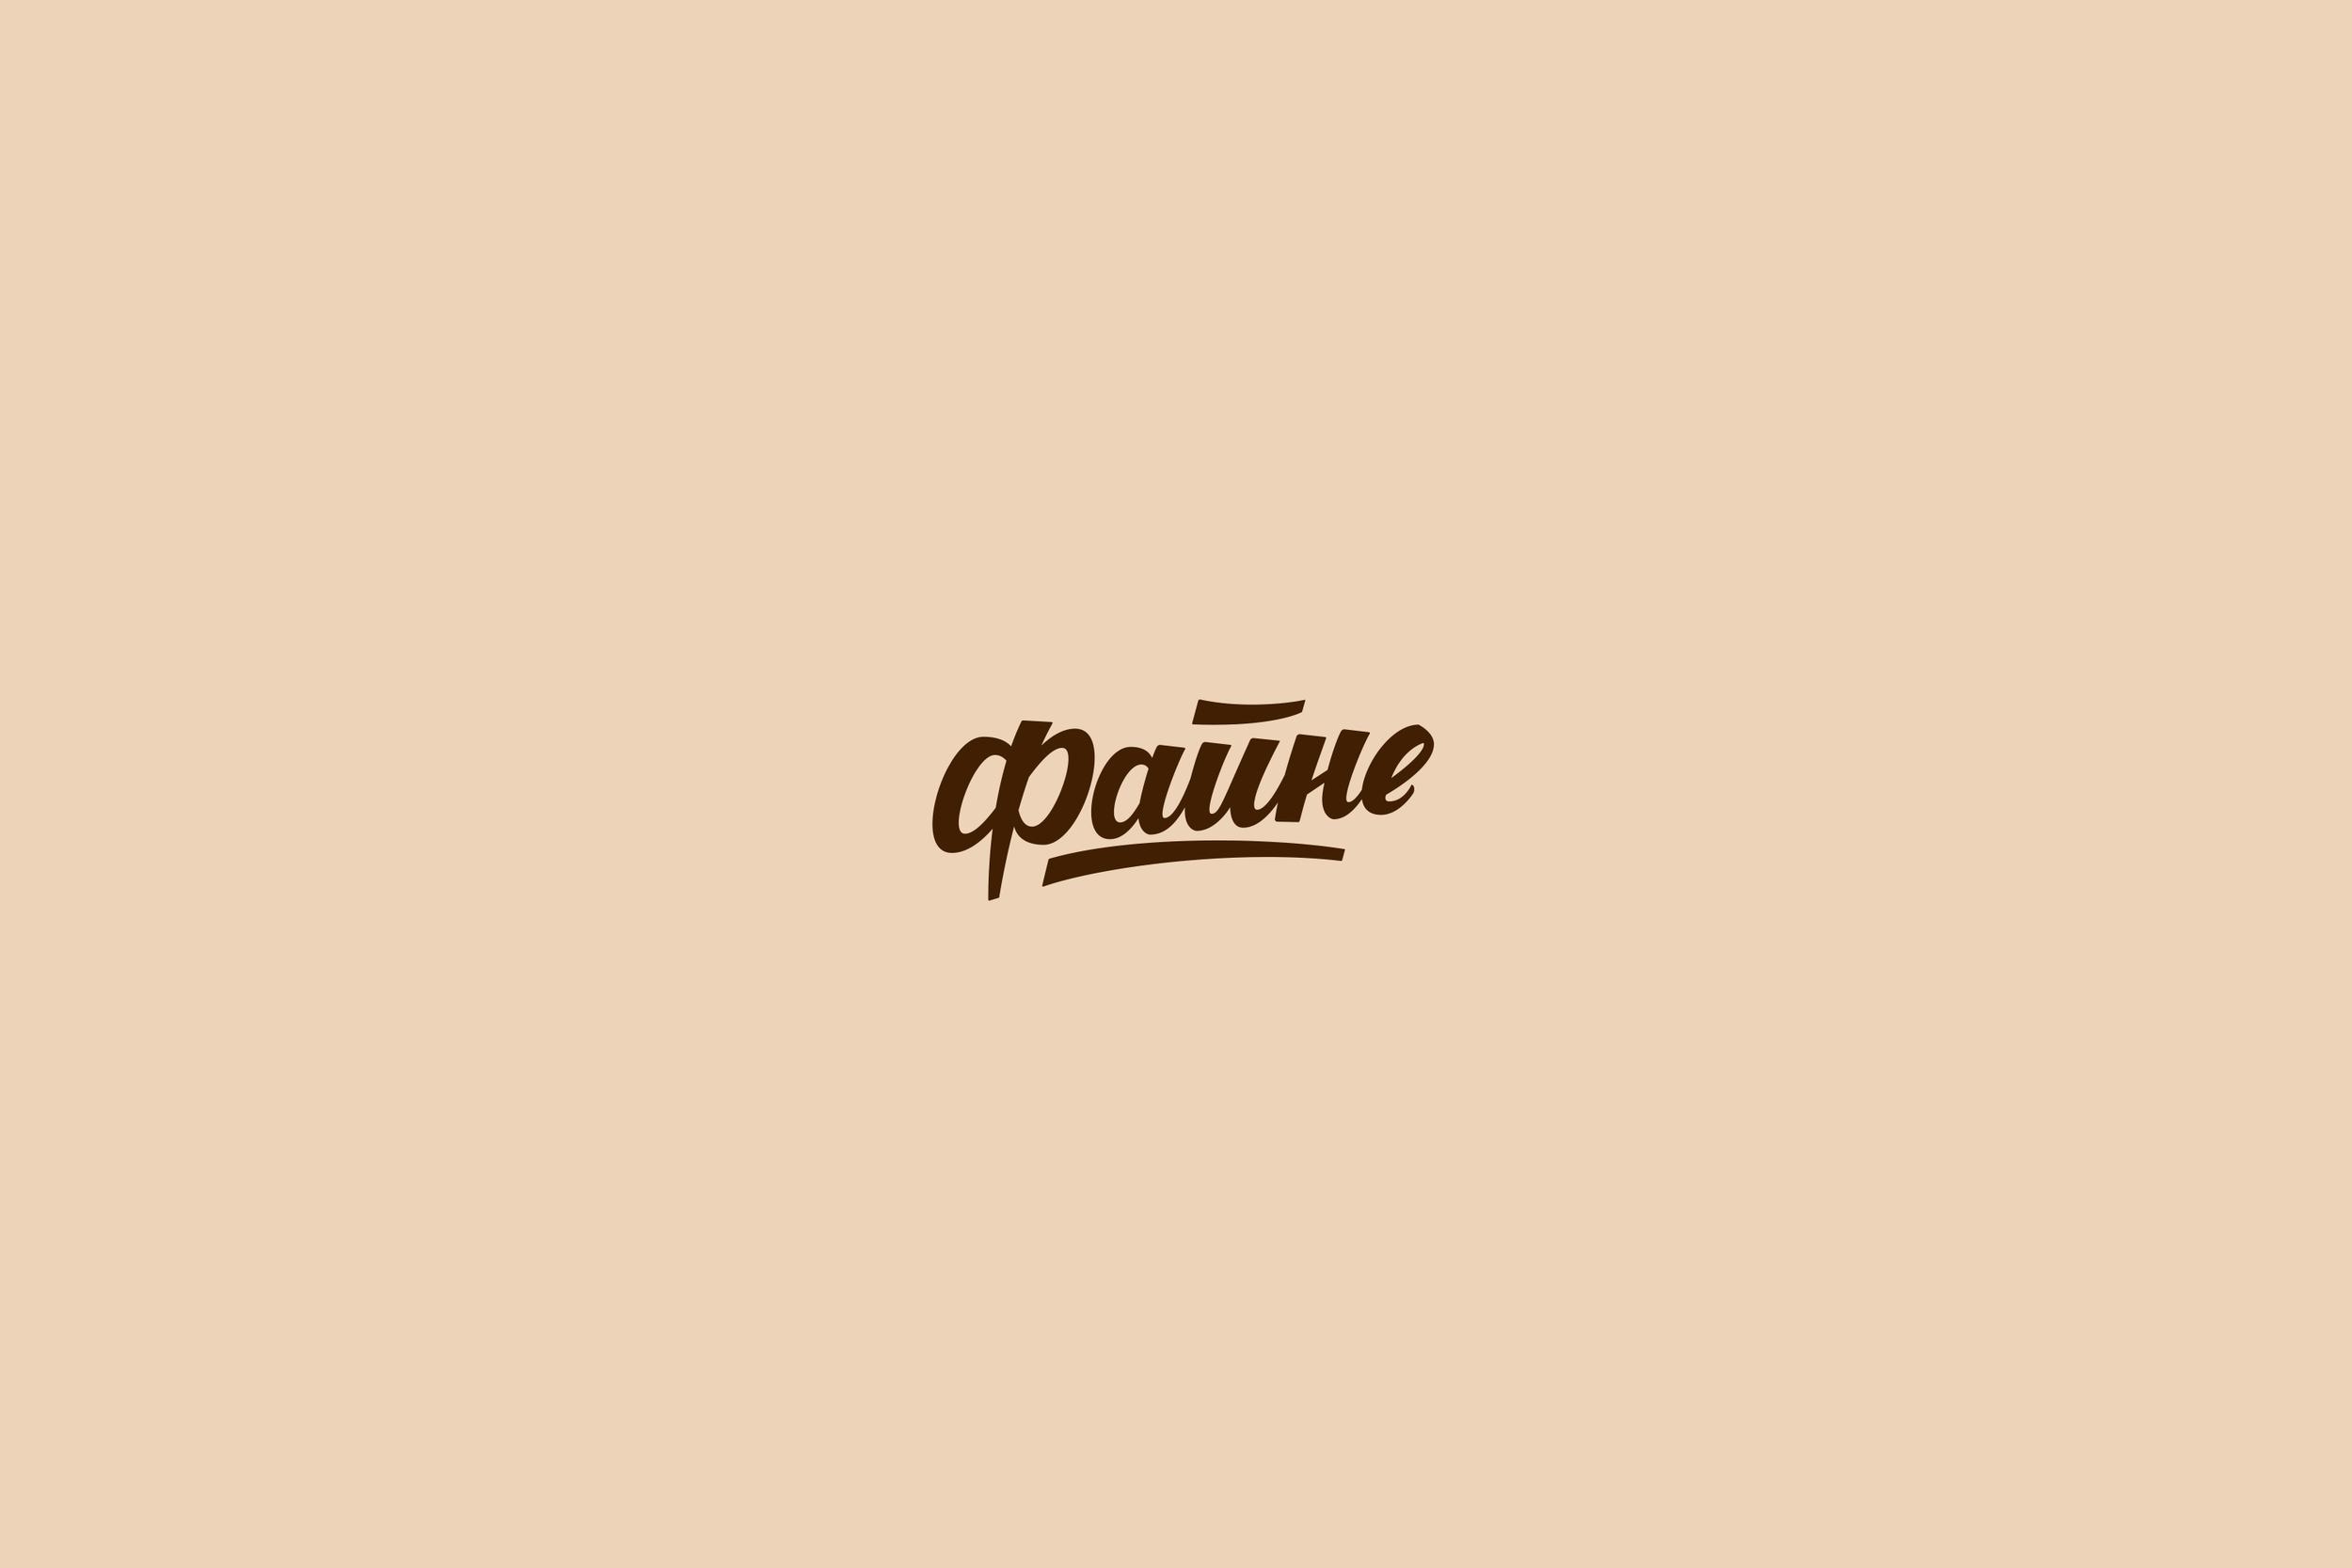 02.-fayne.png